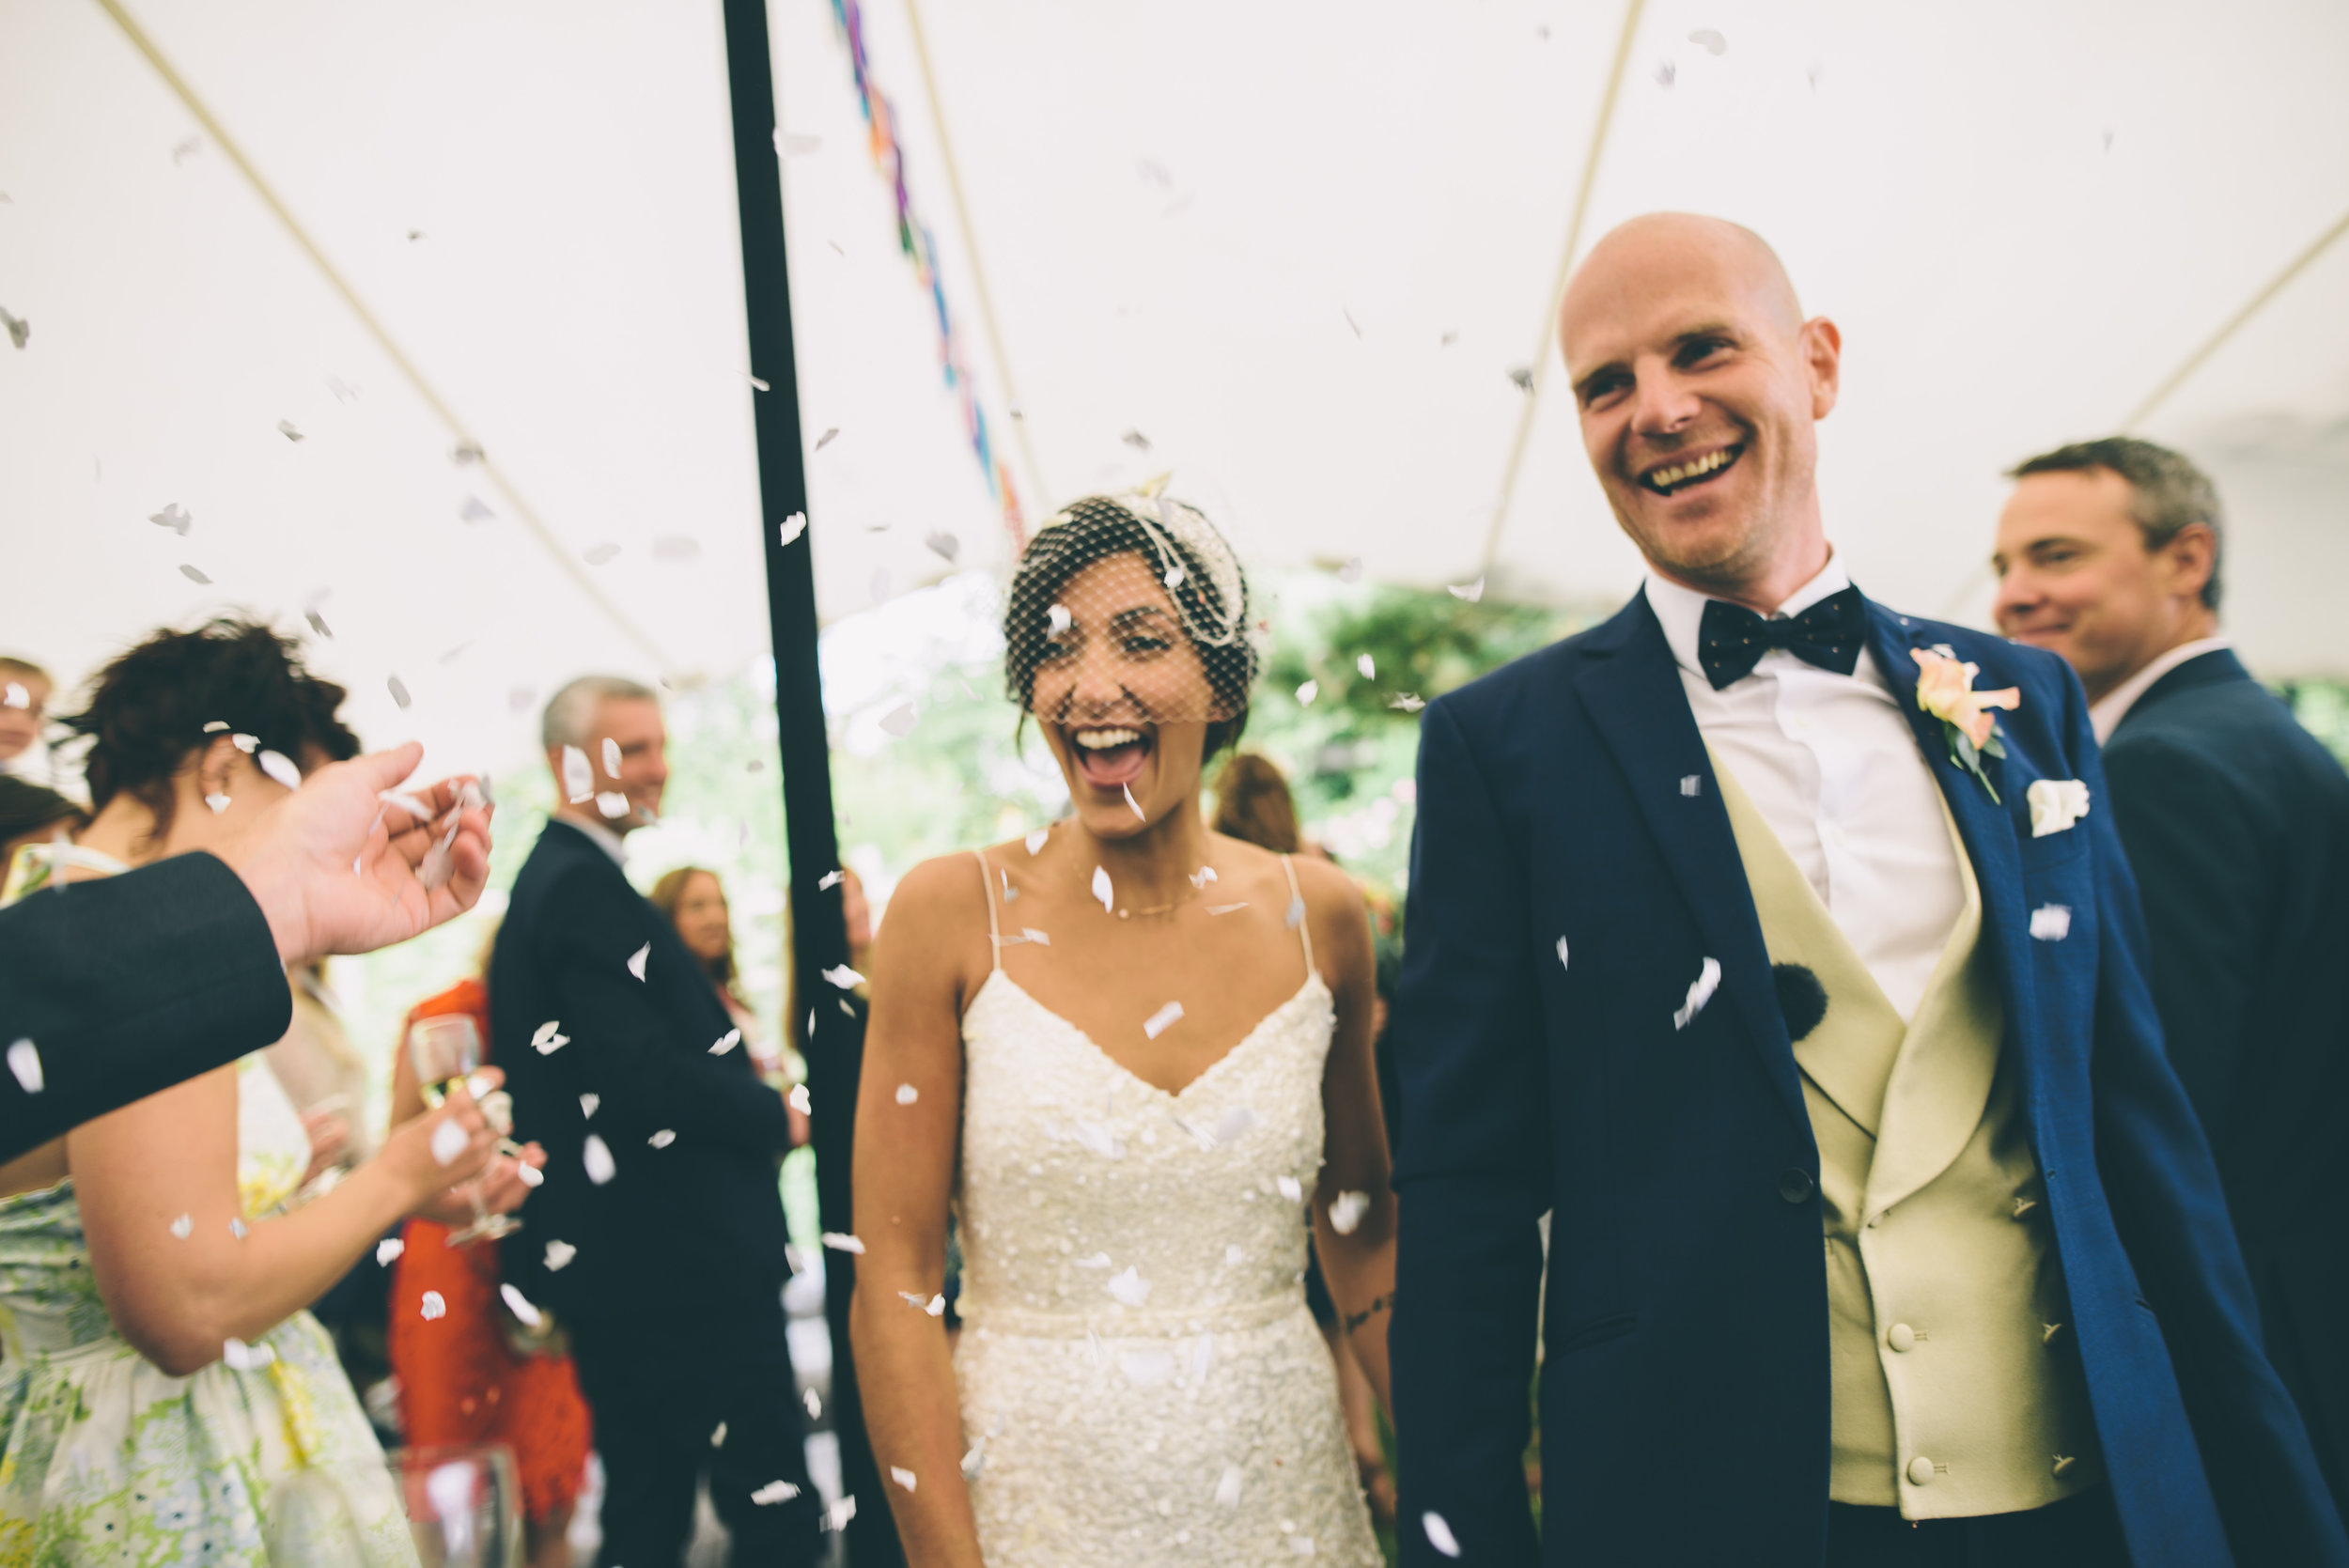 Garden Wedding photography Barley Herefordshire - Tracy + Matt -193.jpg